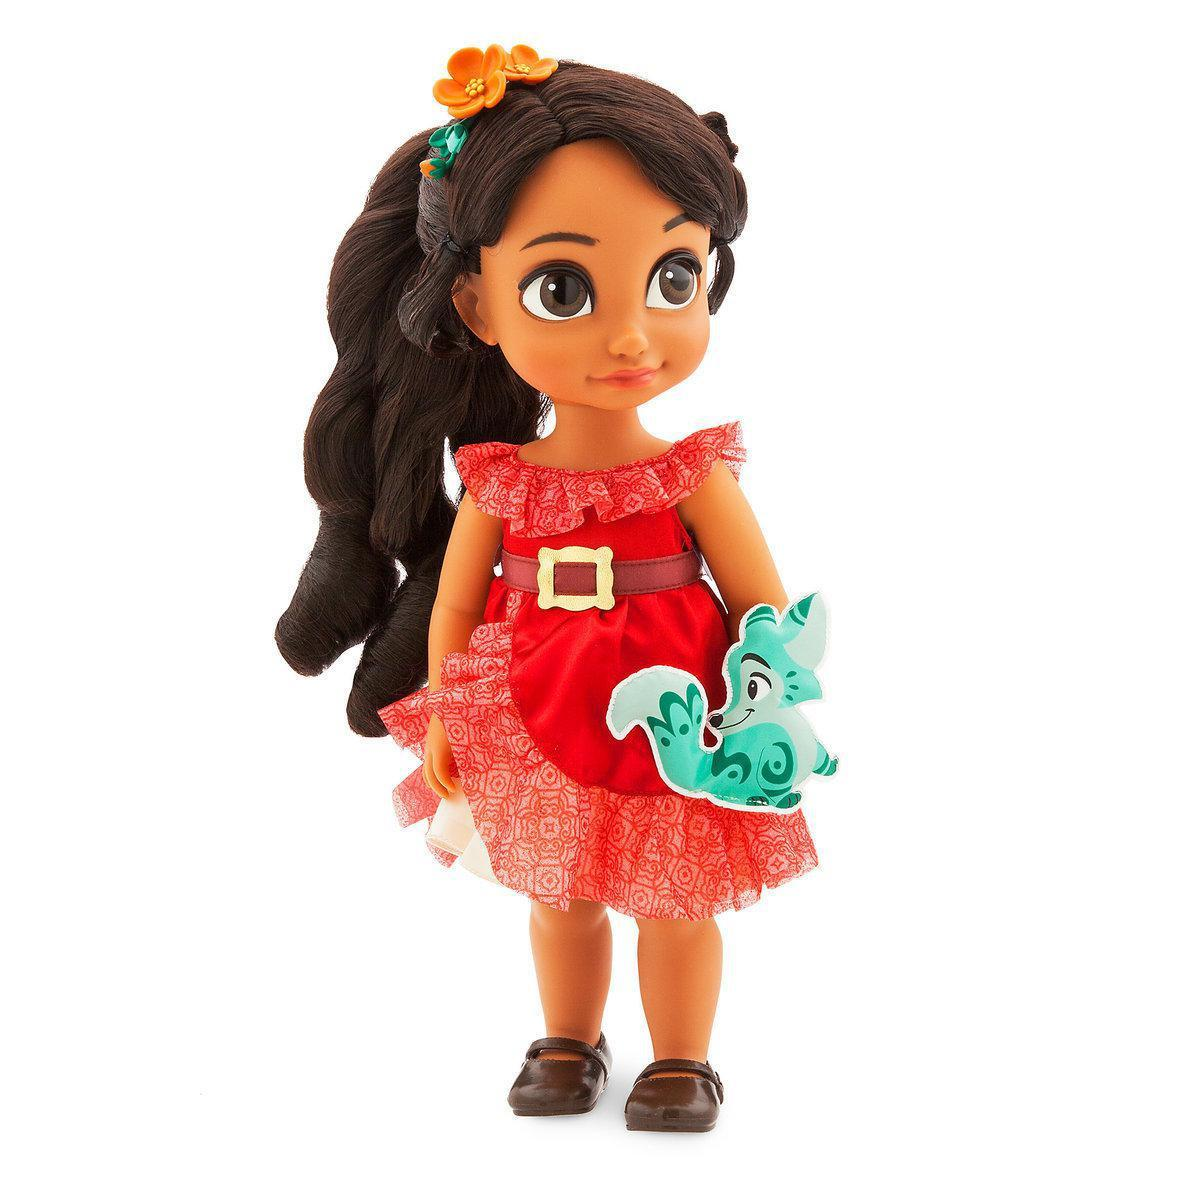 Кукла Дисней аниматор  Елена из Авалора Disney Animators' Collection Elena of Avalor Doll - 16''